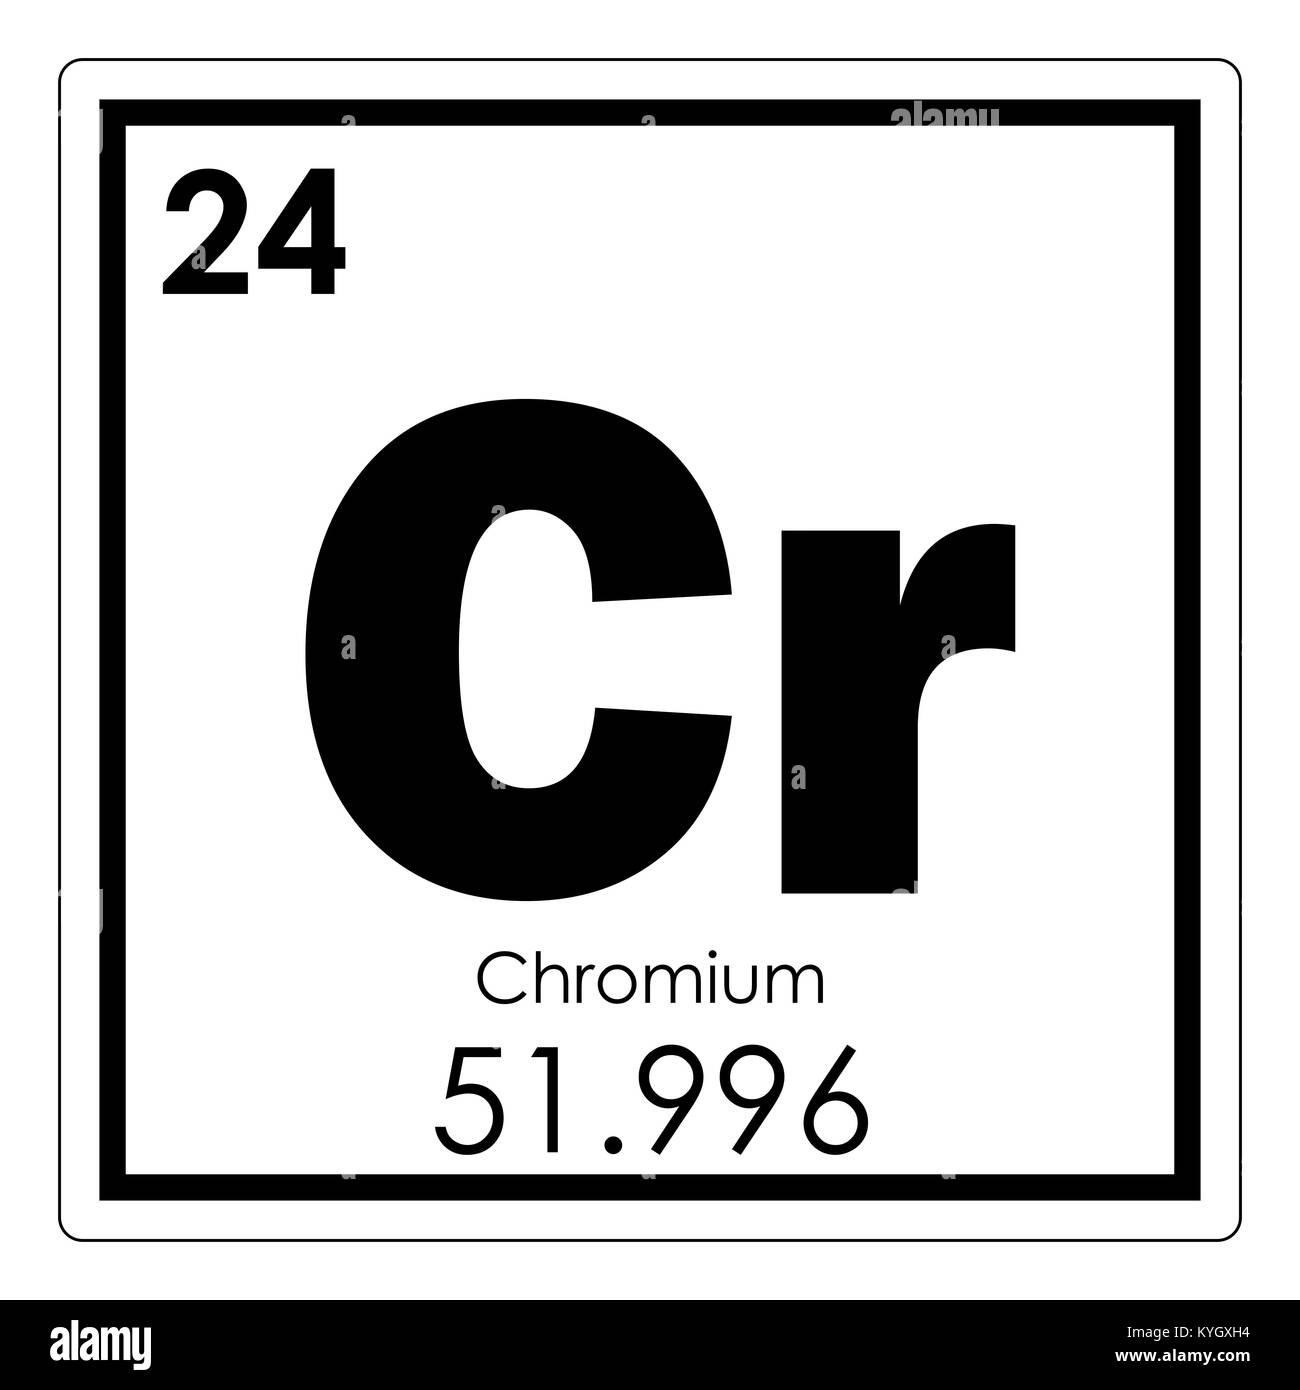 Chromium Chemical Element Periodic Table Science Symbol Stock Photo